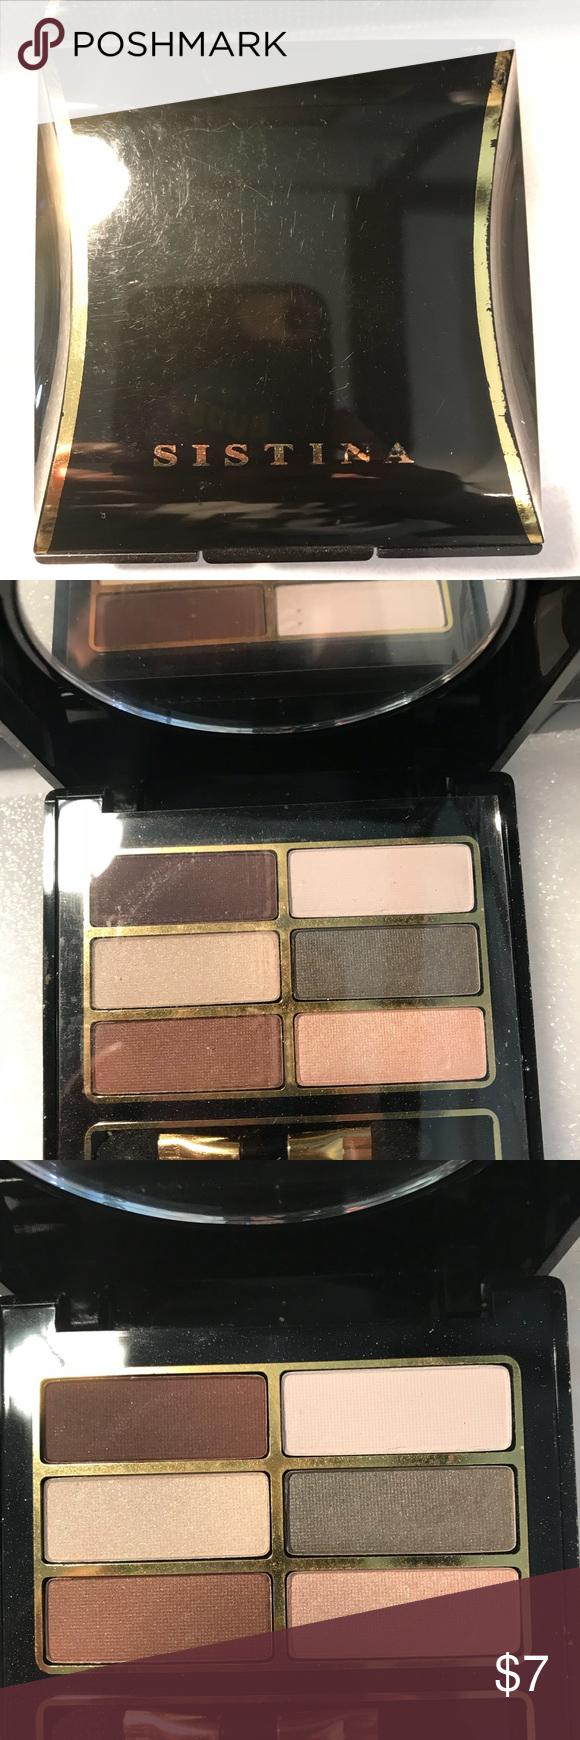 Brand New without Box, Sistina, Eyeshadow, Palette BNWOB